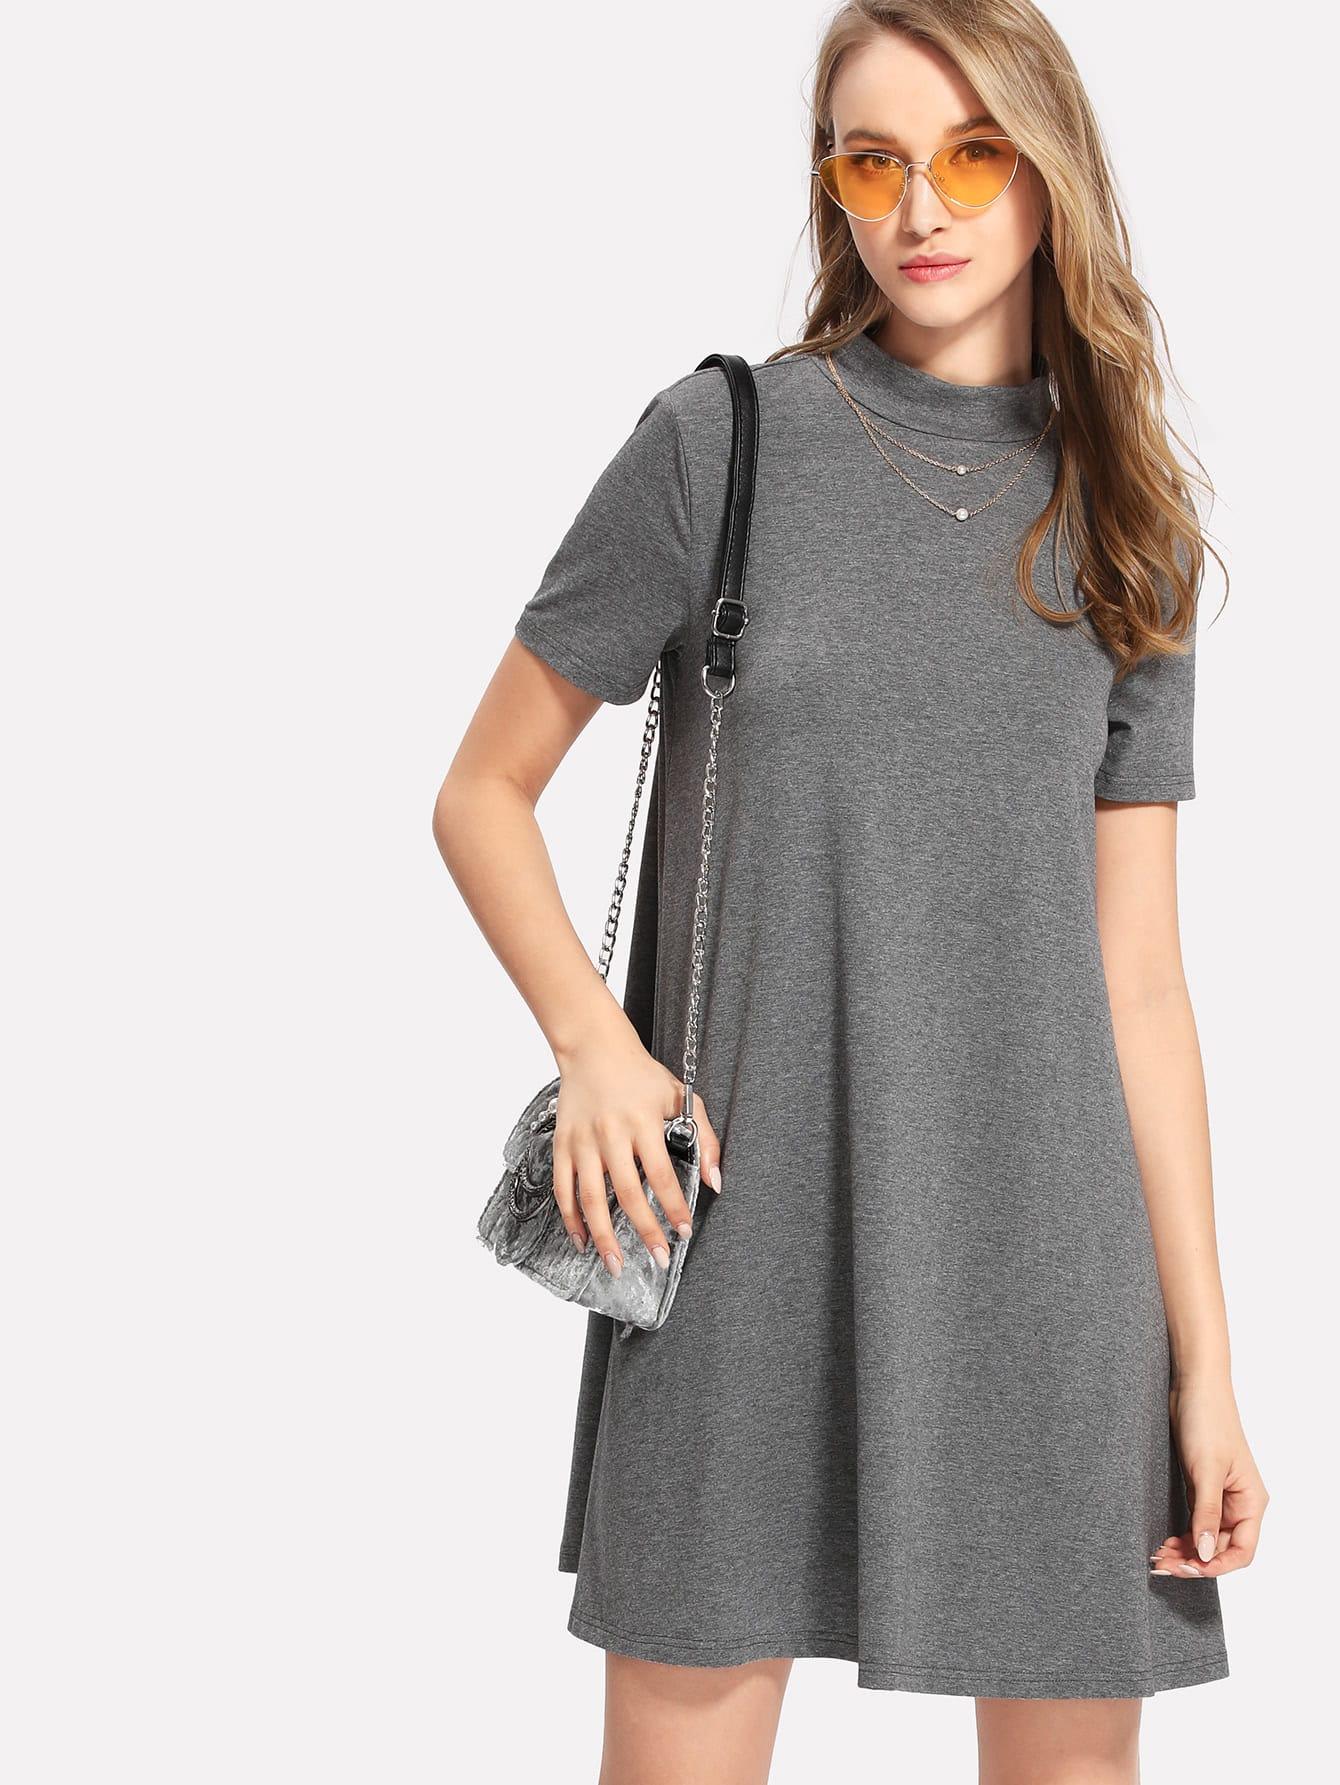 Heather Knit Swing Dress heather knit swing dress